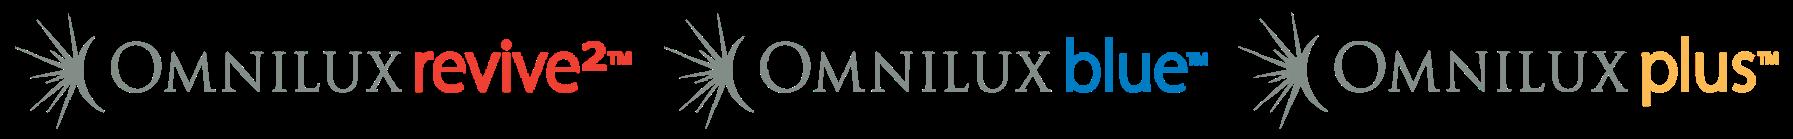 OmniluxledLogo2.png